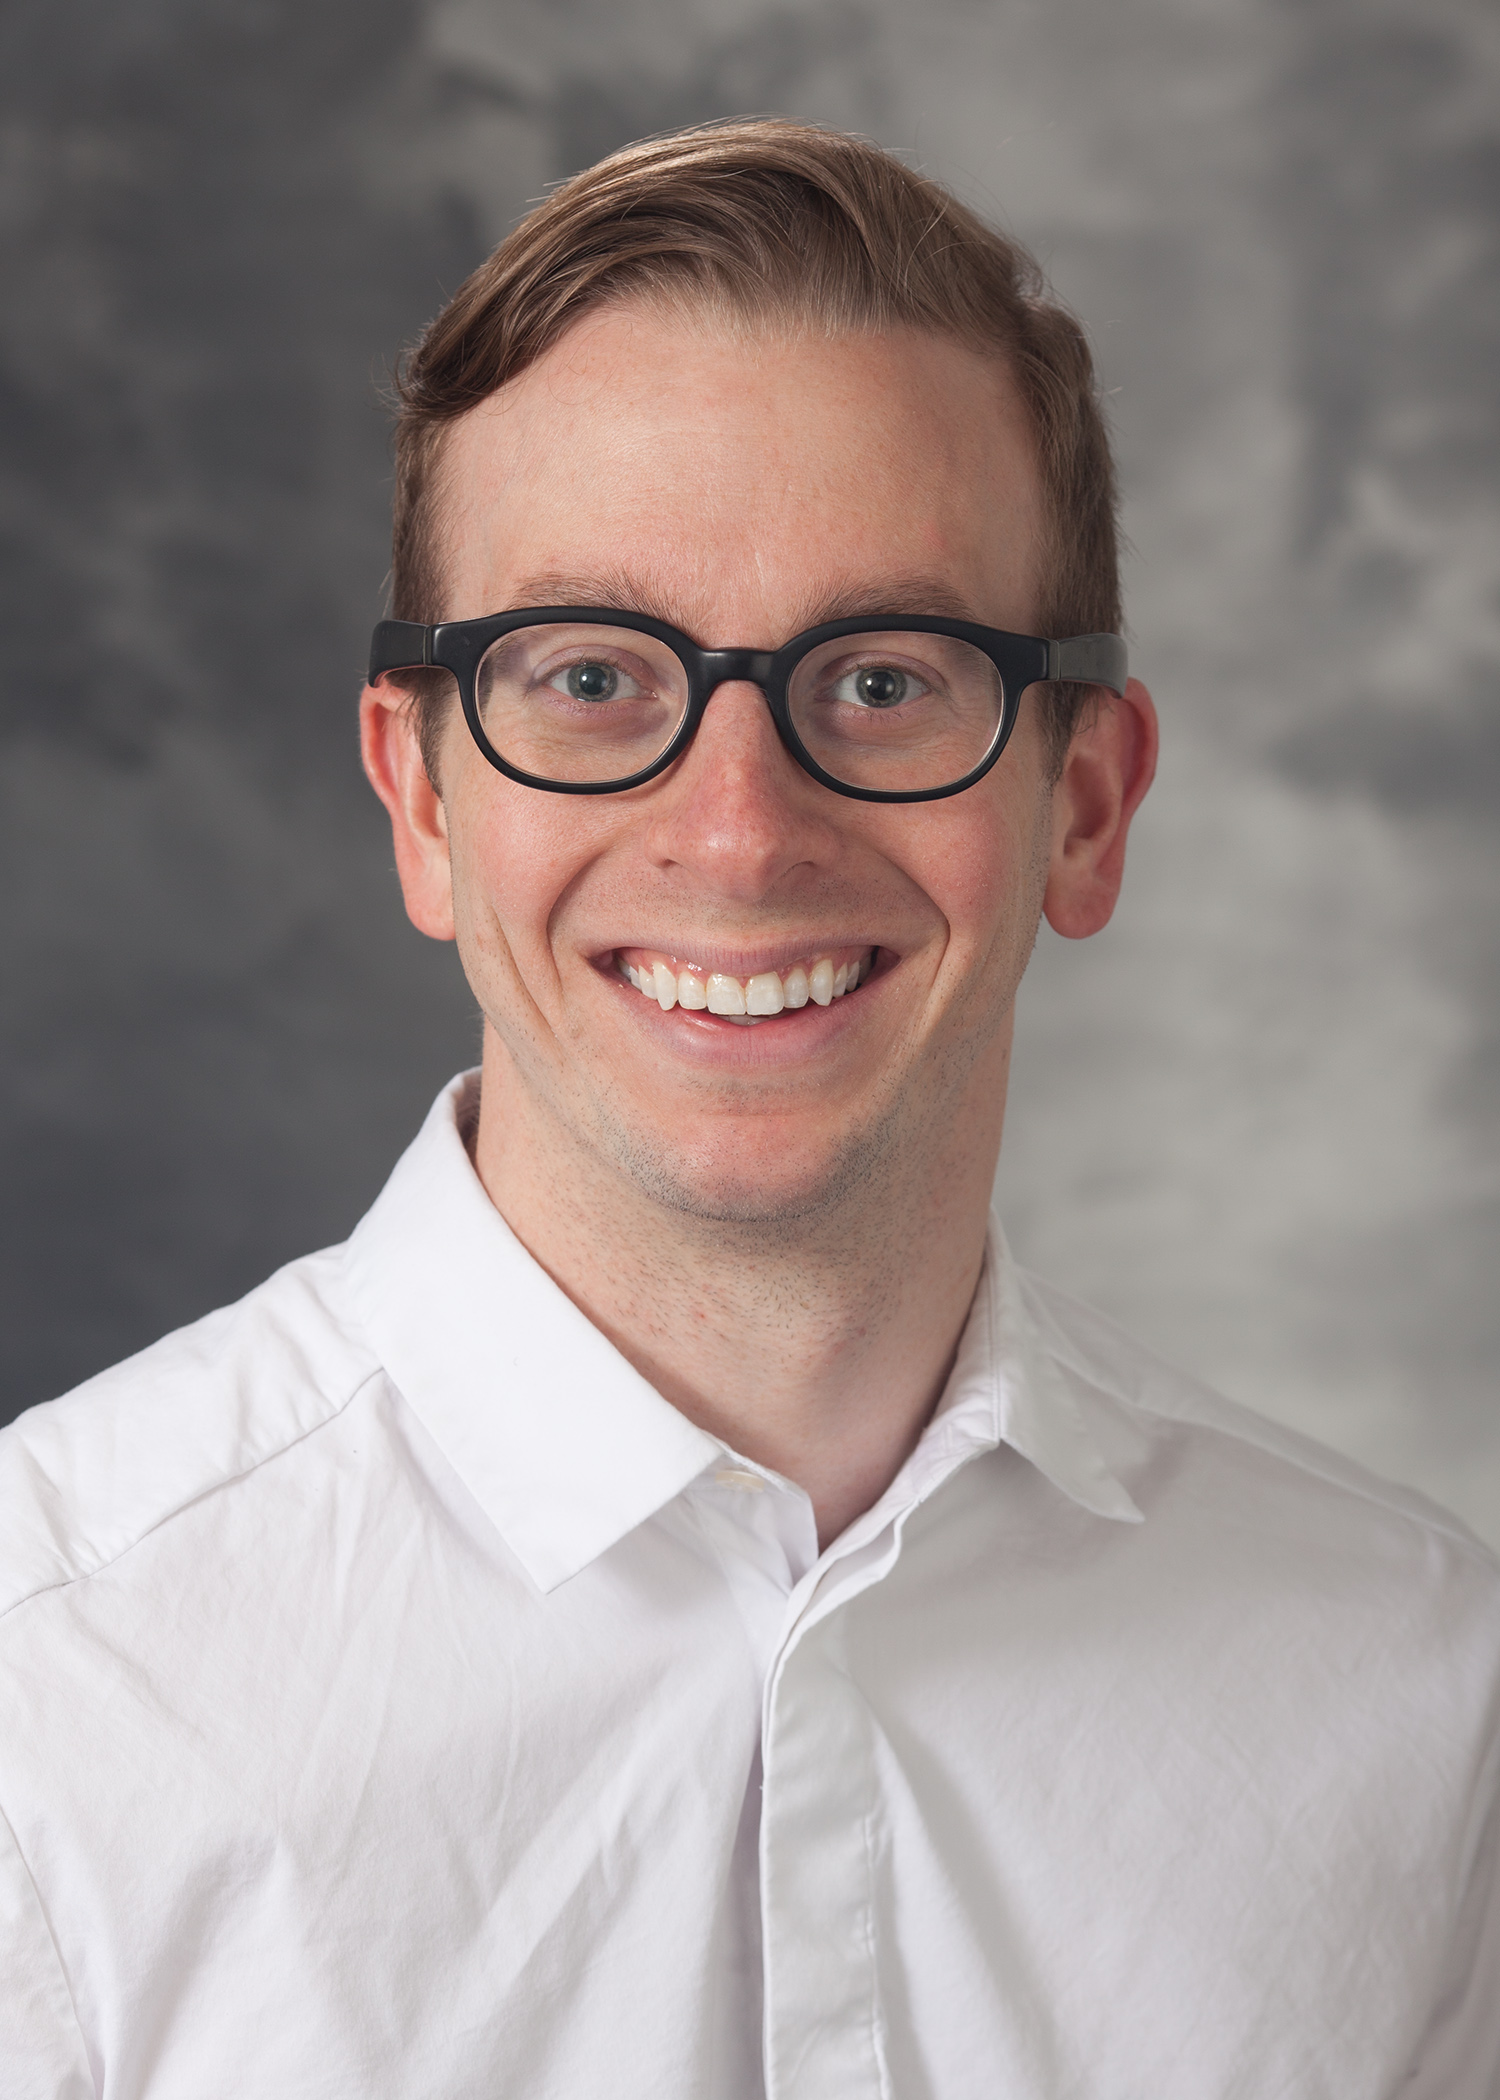 Image of Ryan Moze, Interim HIPAA Privacy Officer